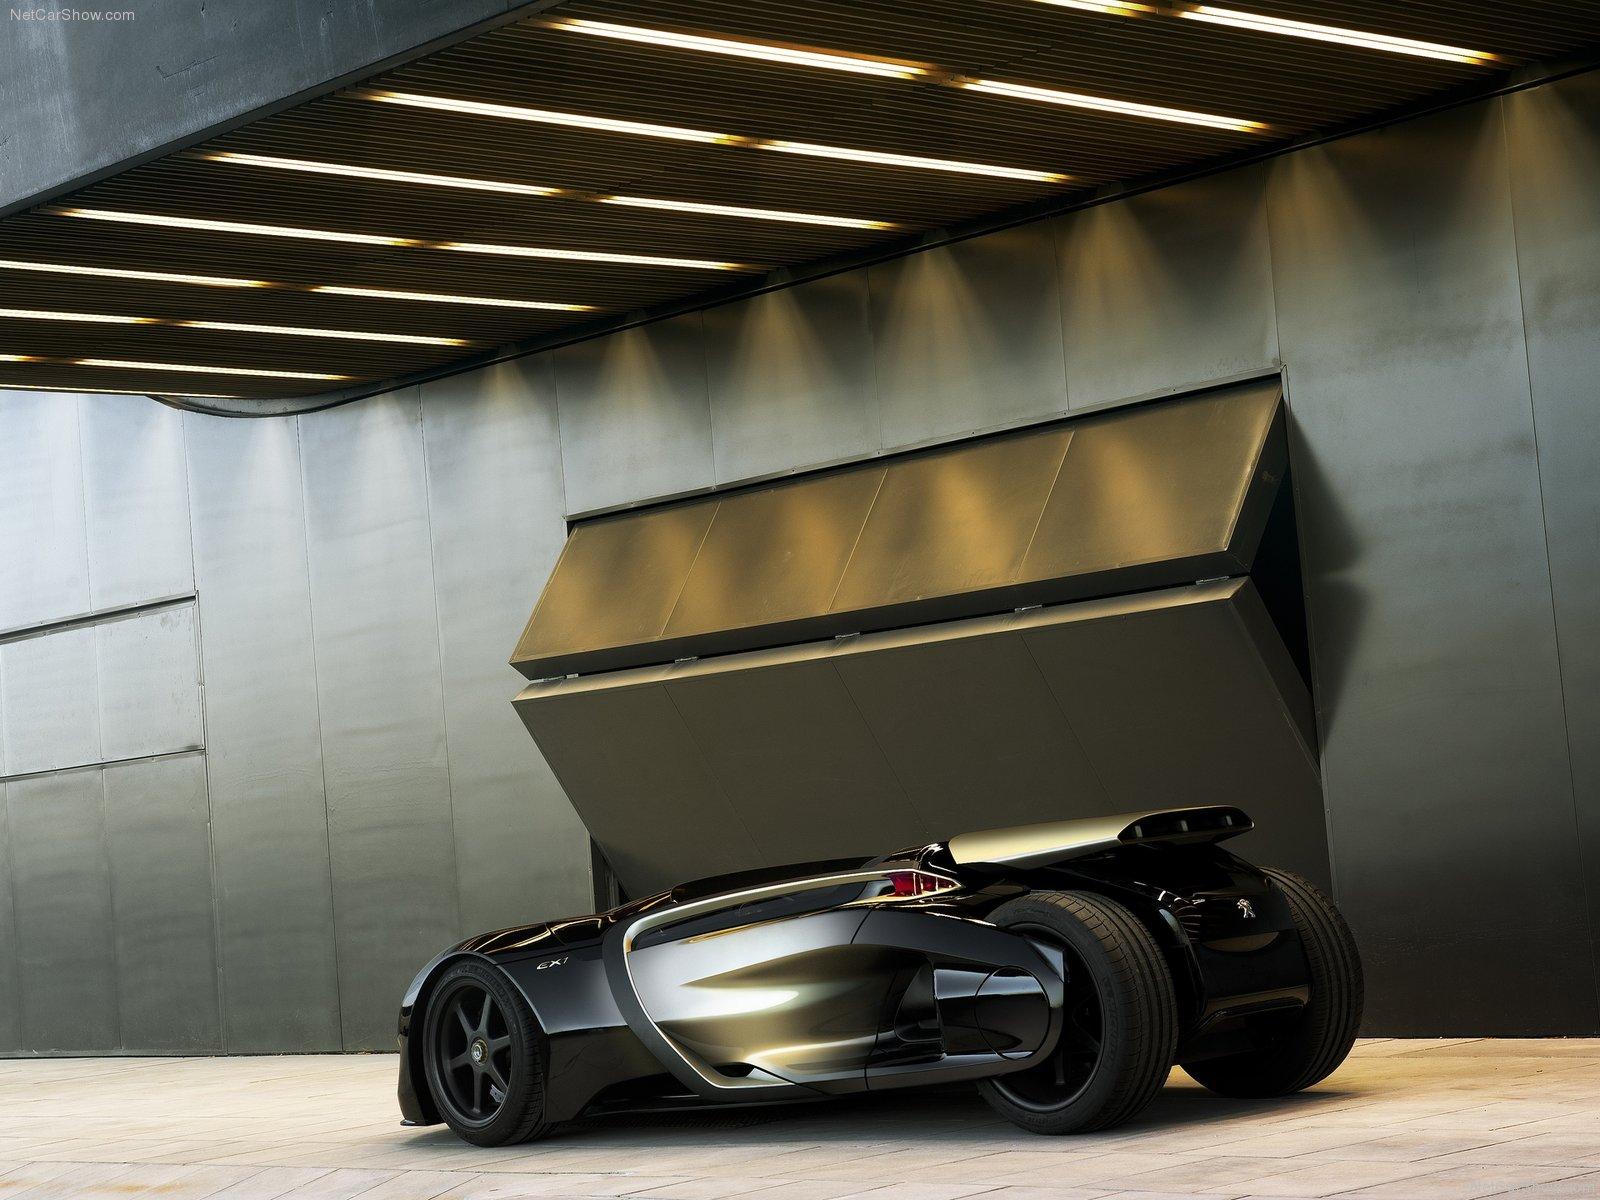 New Peugeot EX1 Pictures